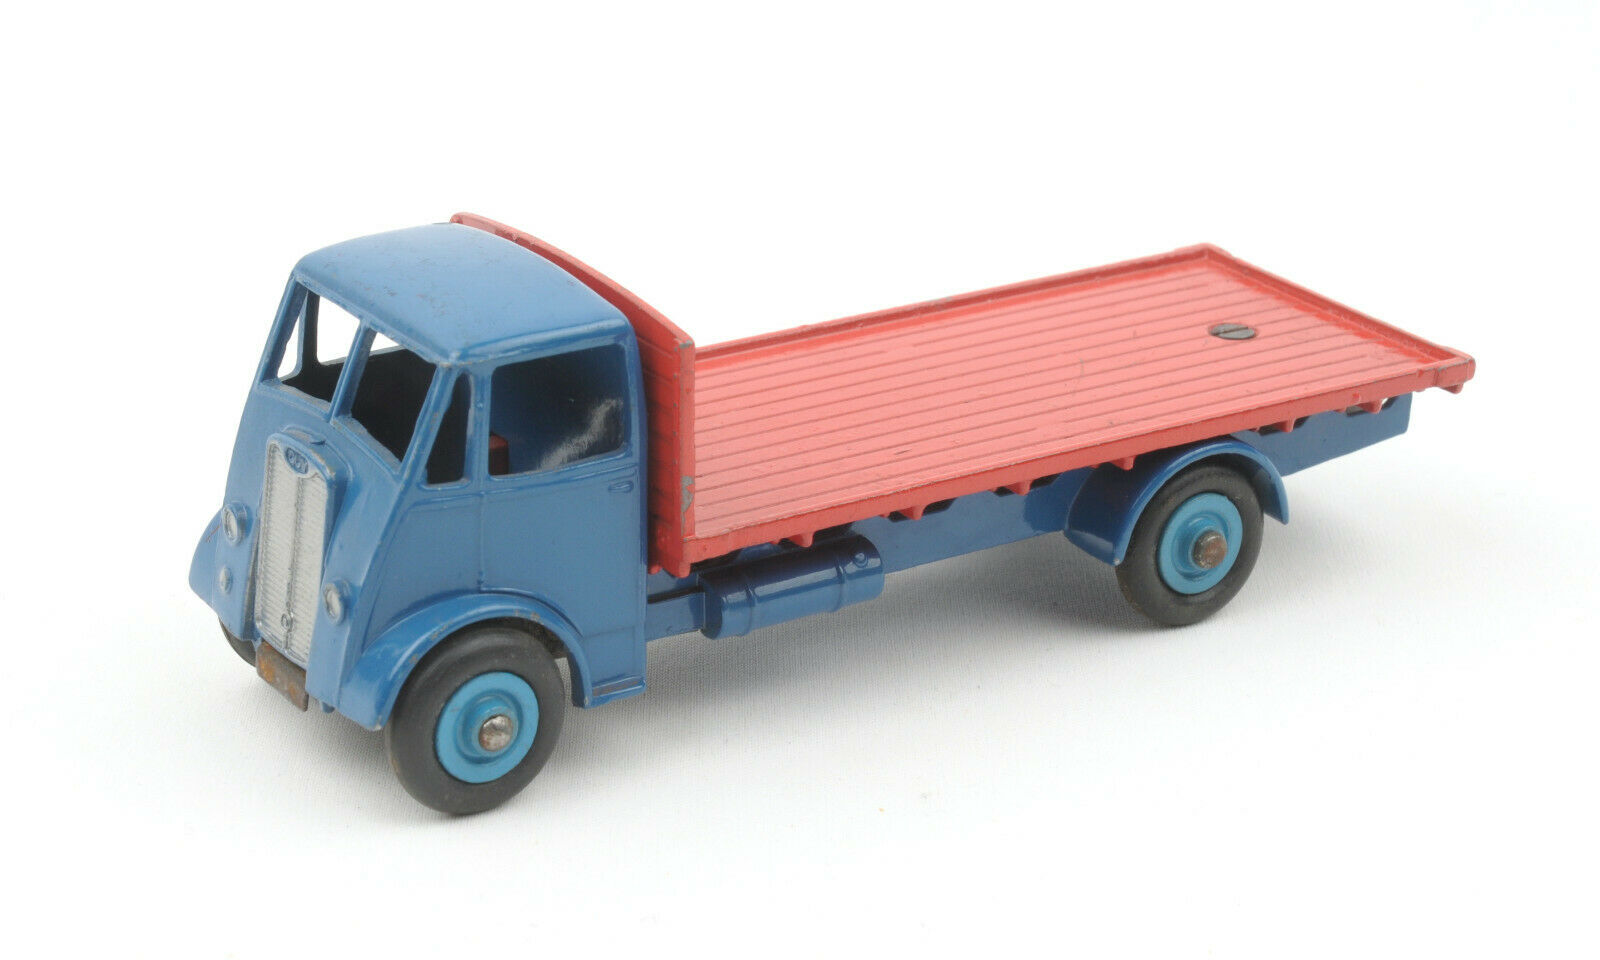 VINTAGE Dinky Supertoys 512 Guy piatto camion 1952-54  nr. Nuovo di zecca